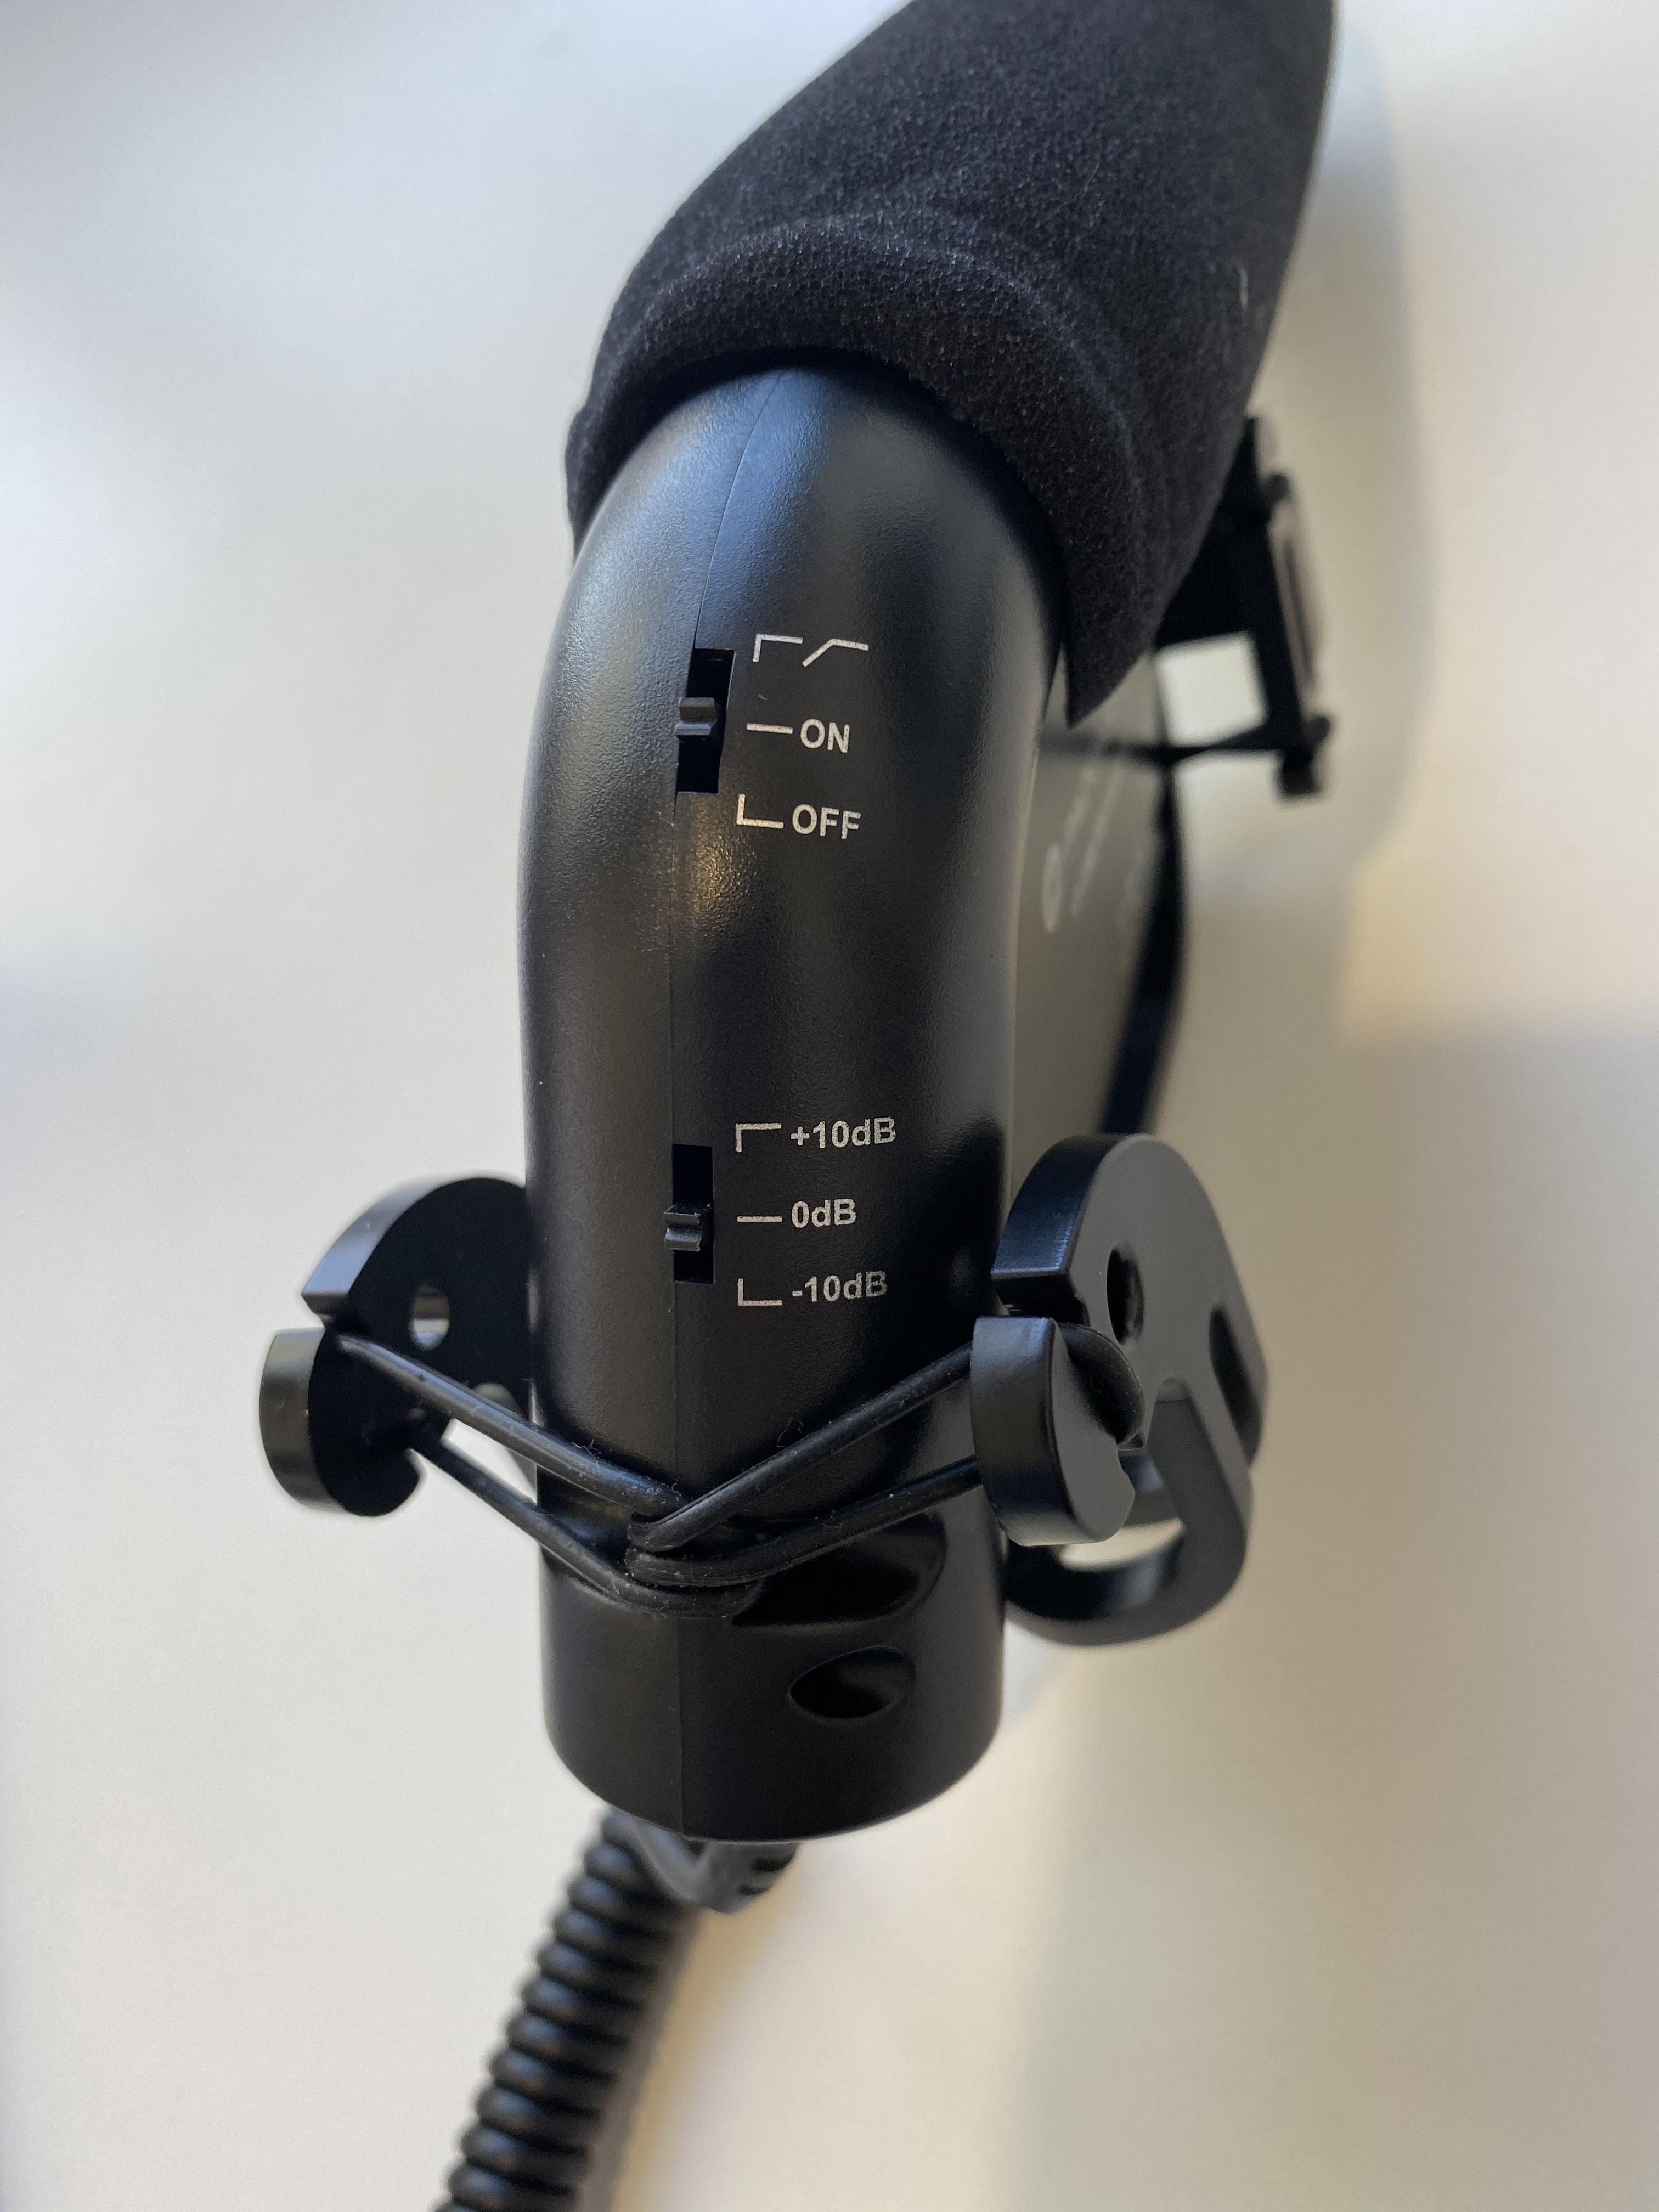 Microphone_Controls.jpg